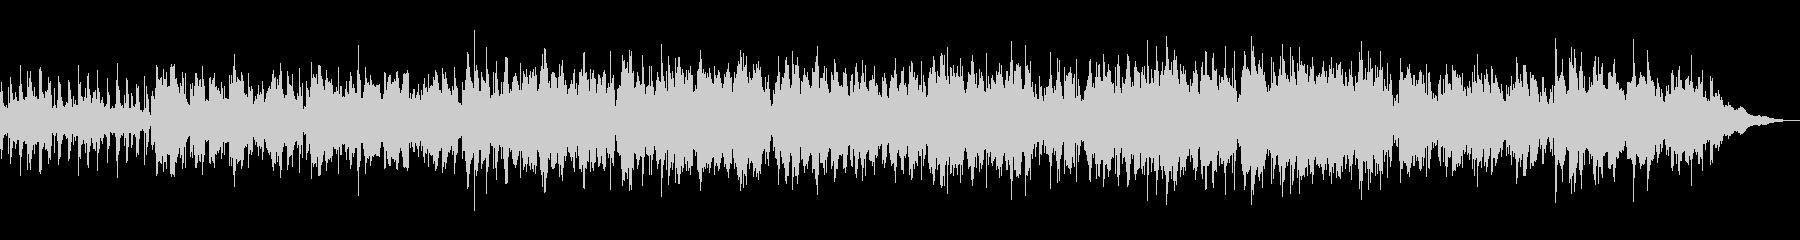 Oriental musicの未再生の波形